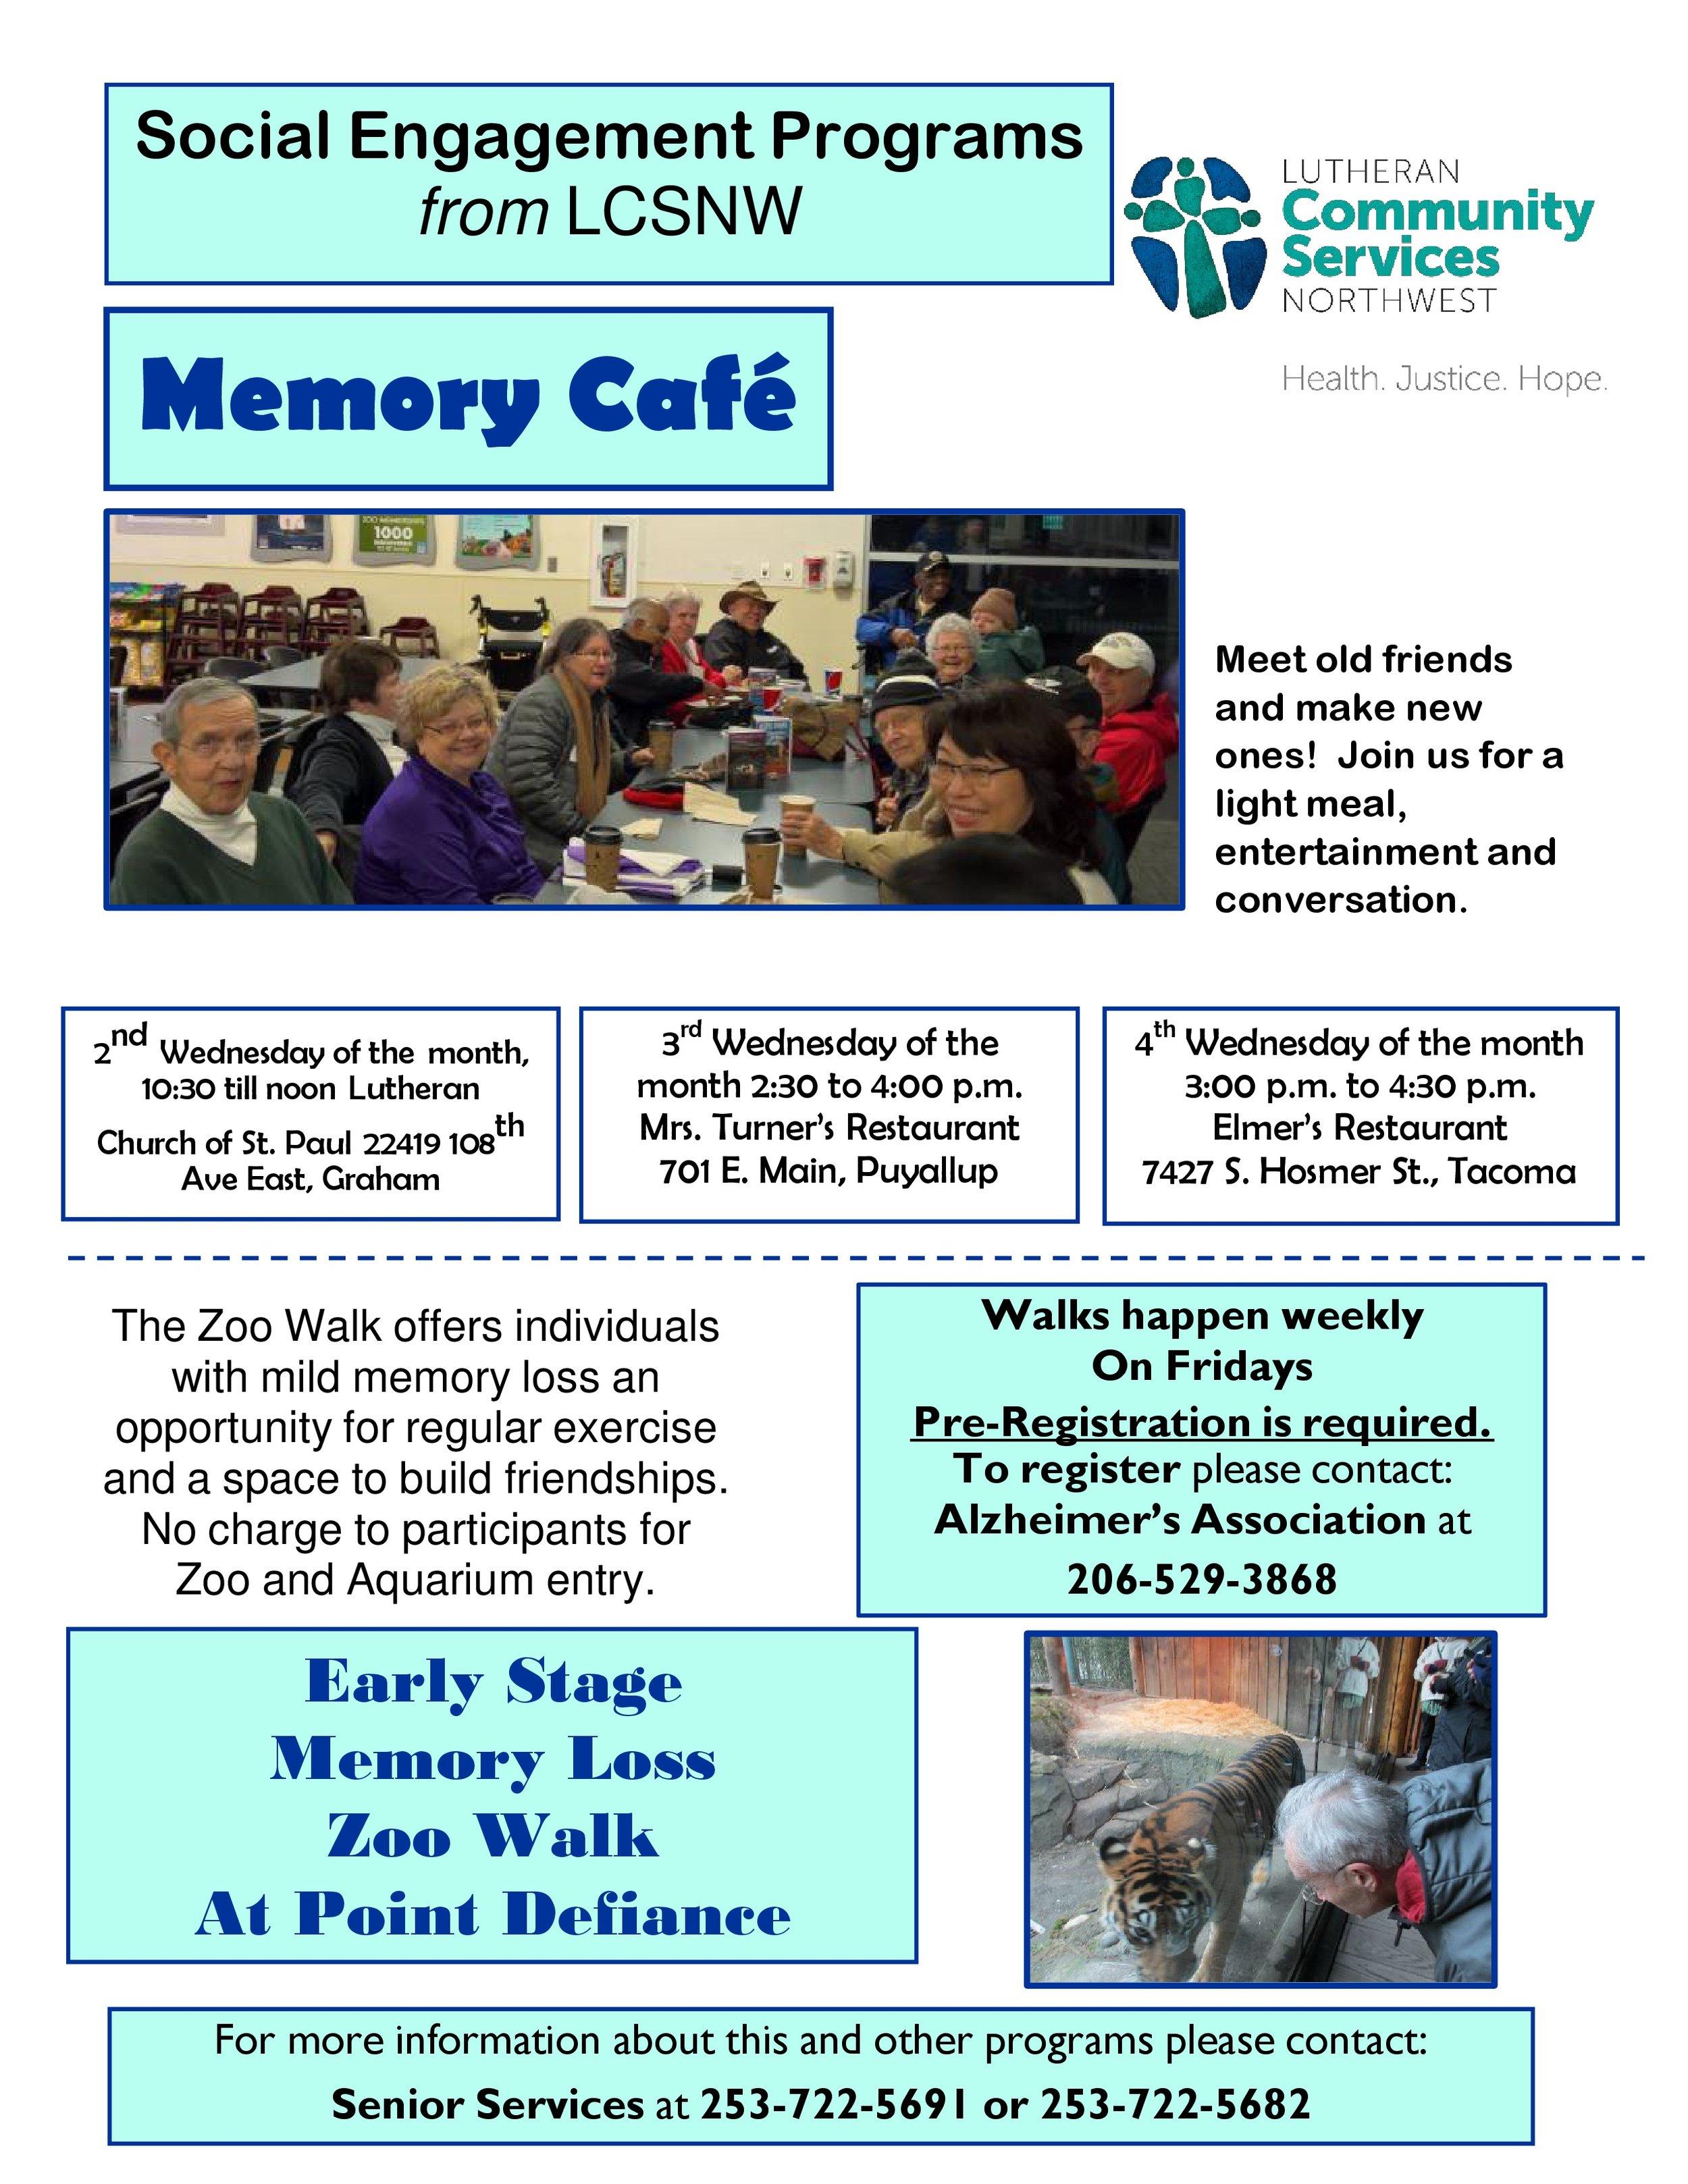 Alz Cafes Tacoma (3)Social Engagement MC3 - Zoo-page-0.jpg